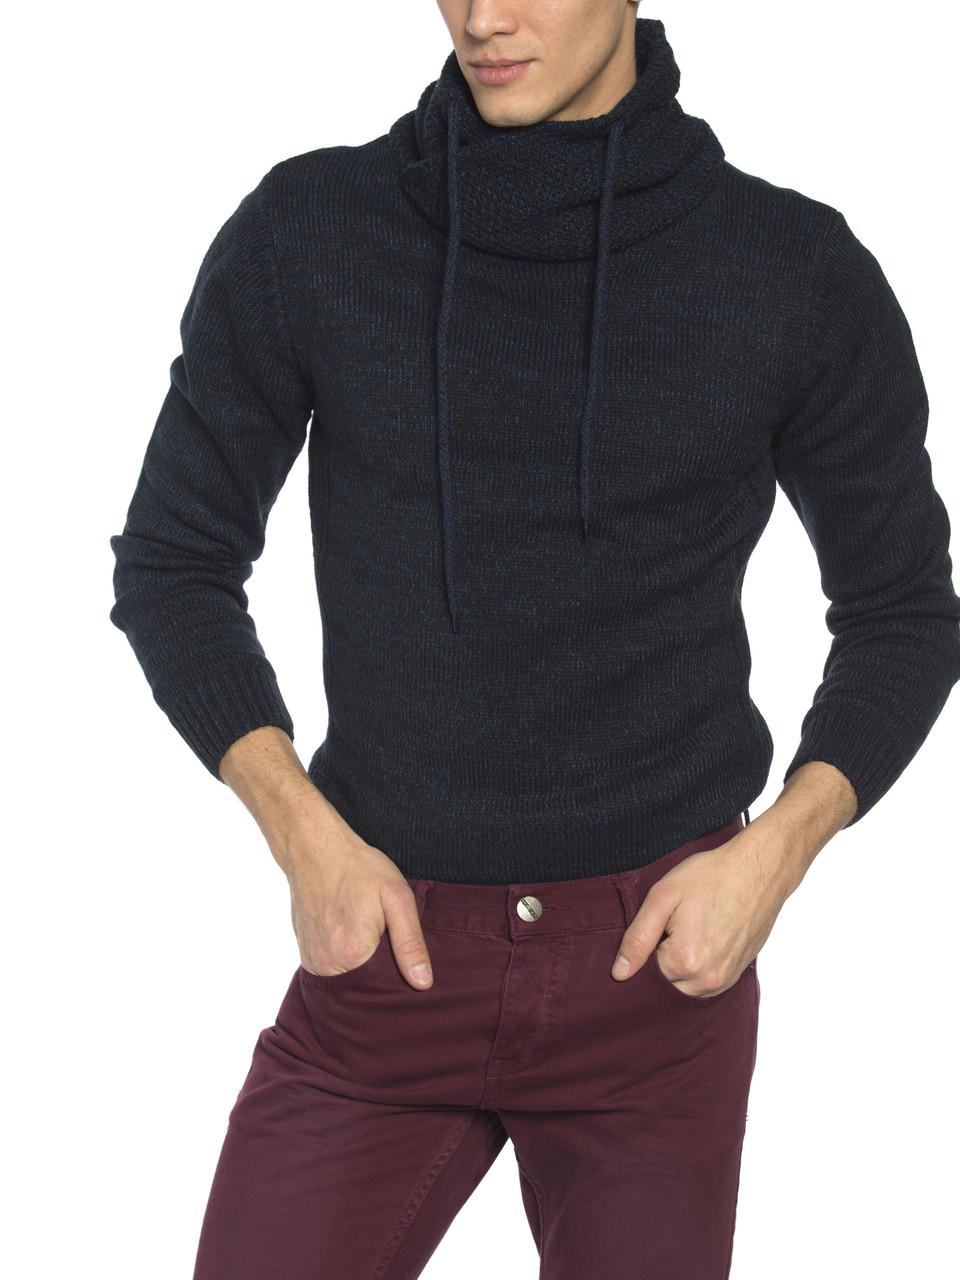 Мужской свитер LC Waikiki/ЛС Вайкики темно-синего цвета с воротником хомут